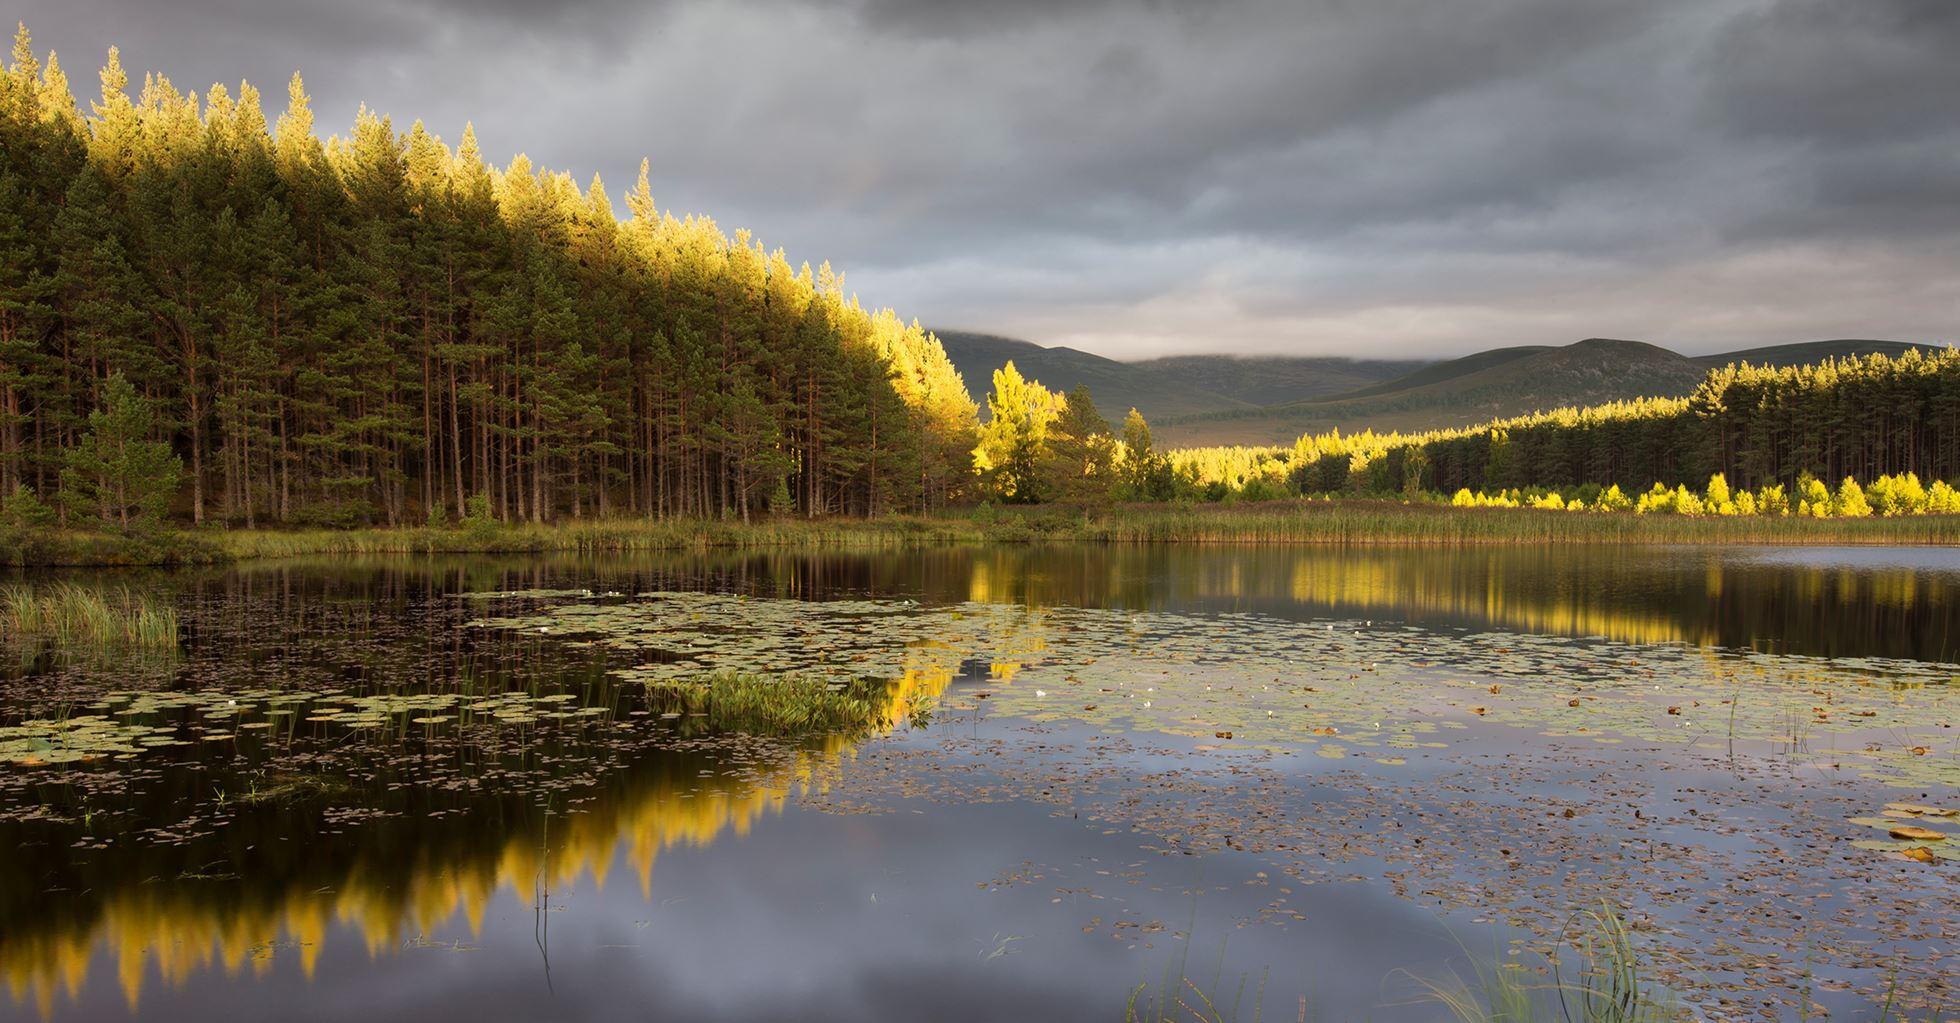 Image - Uath Lochans